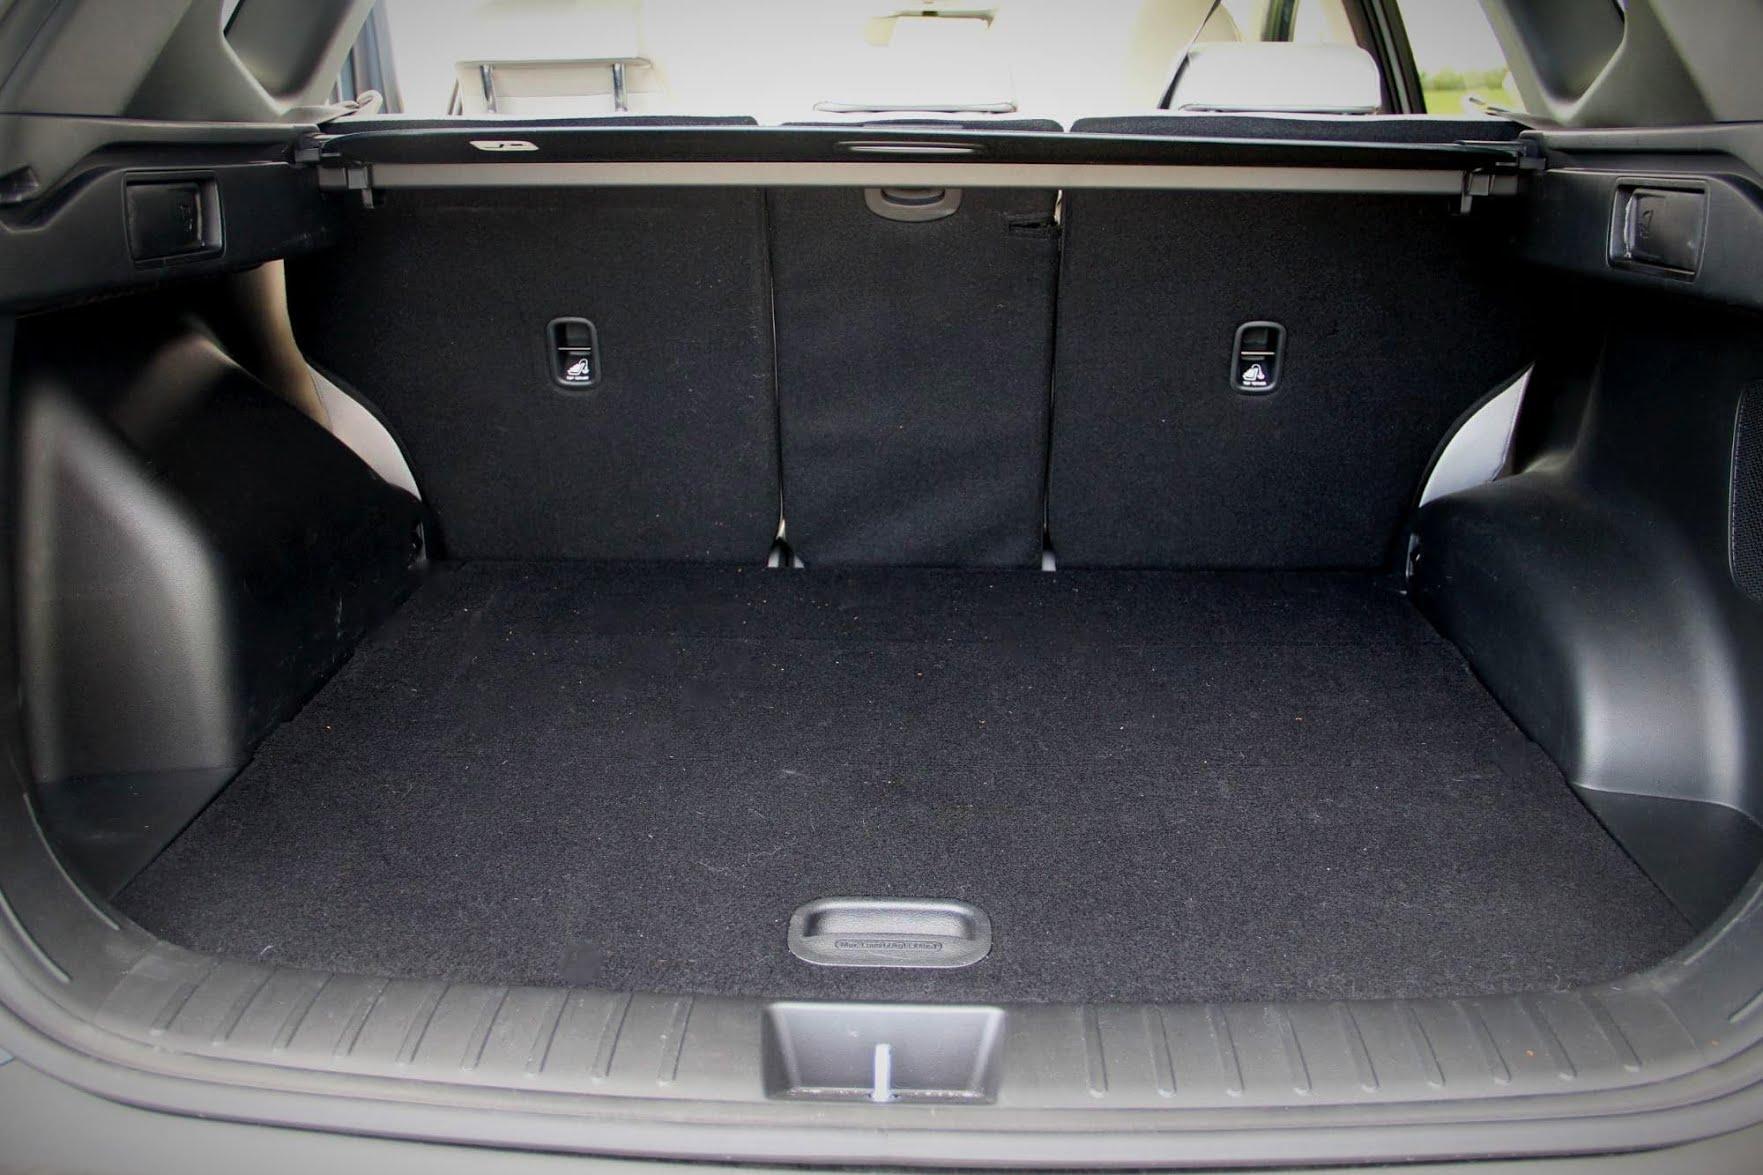 Le grand coffre du Hyundai Tucson hybride 2021